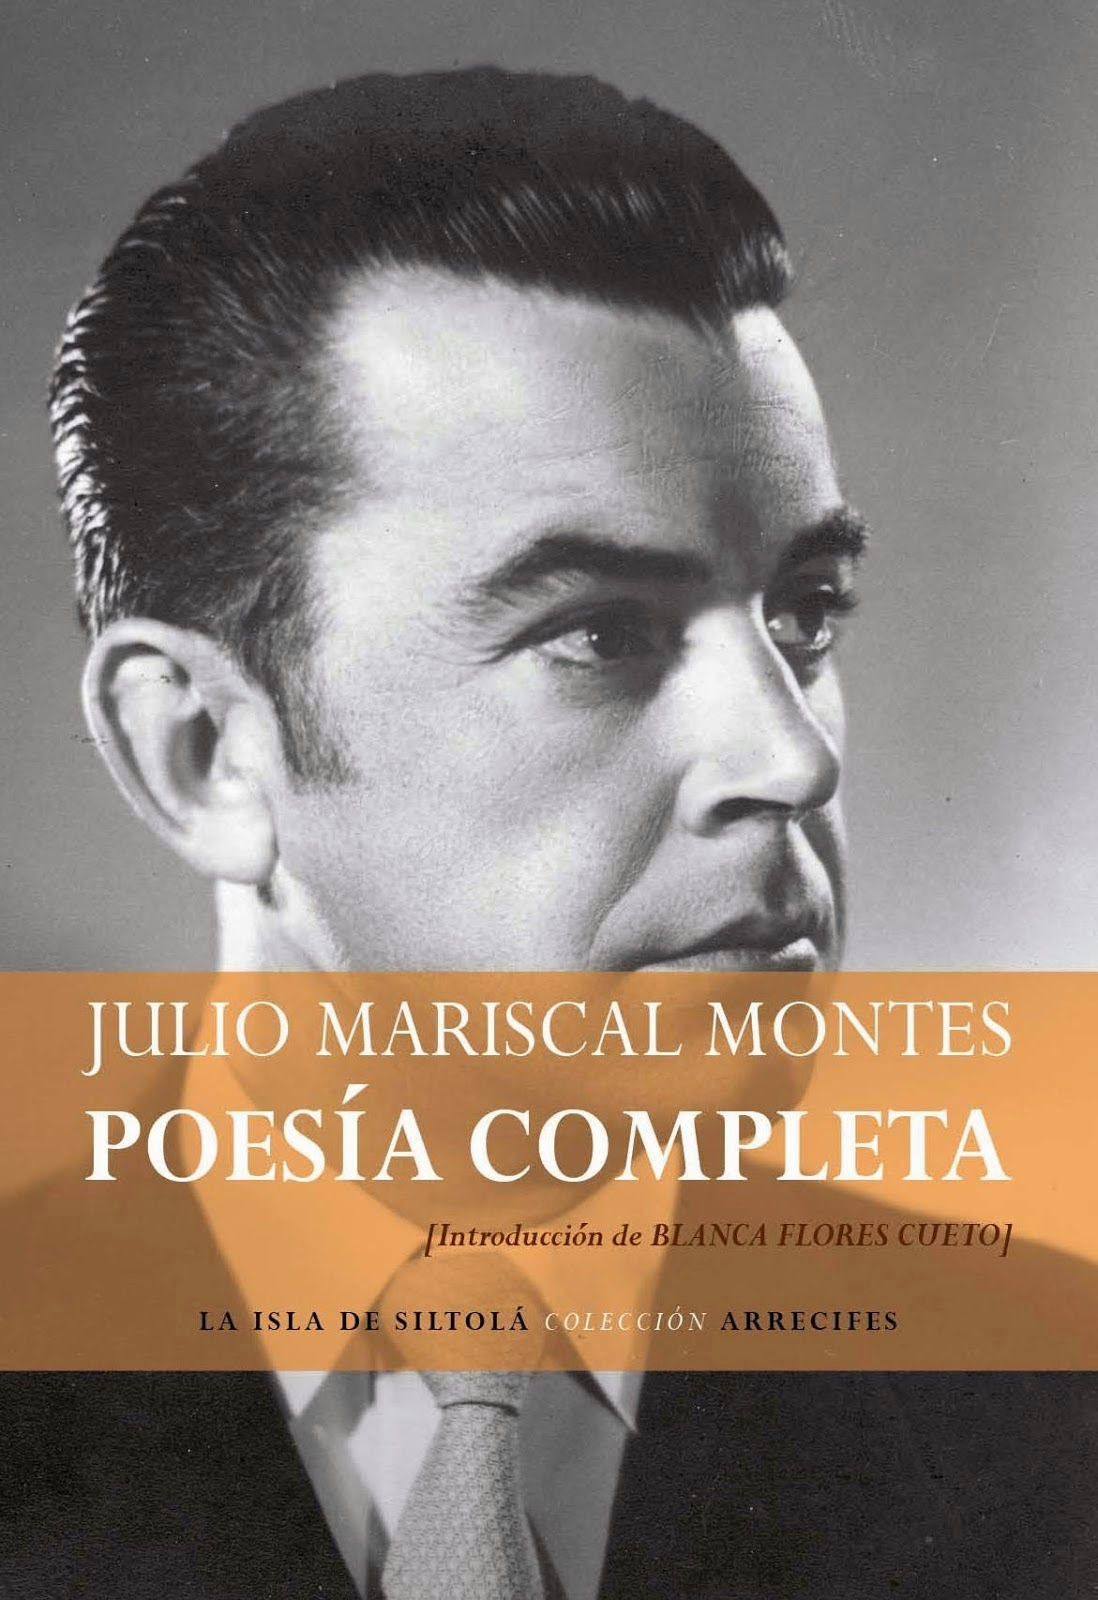 http://encuentrosconlasletras.blogspot.com.es/2014/12/julio-mariscal-poesia-completa.html